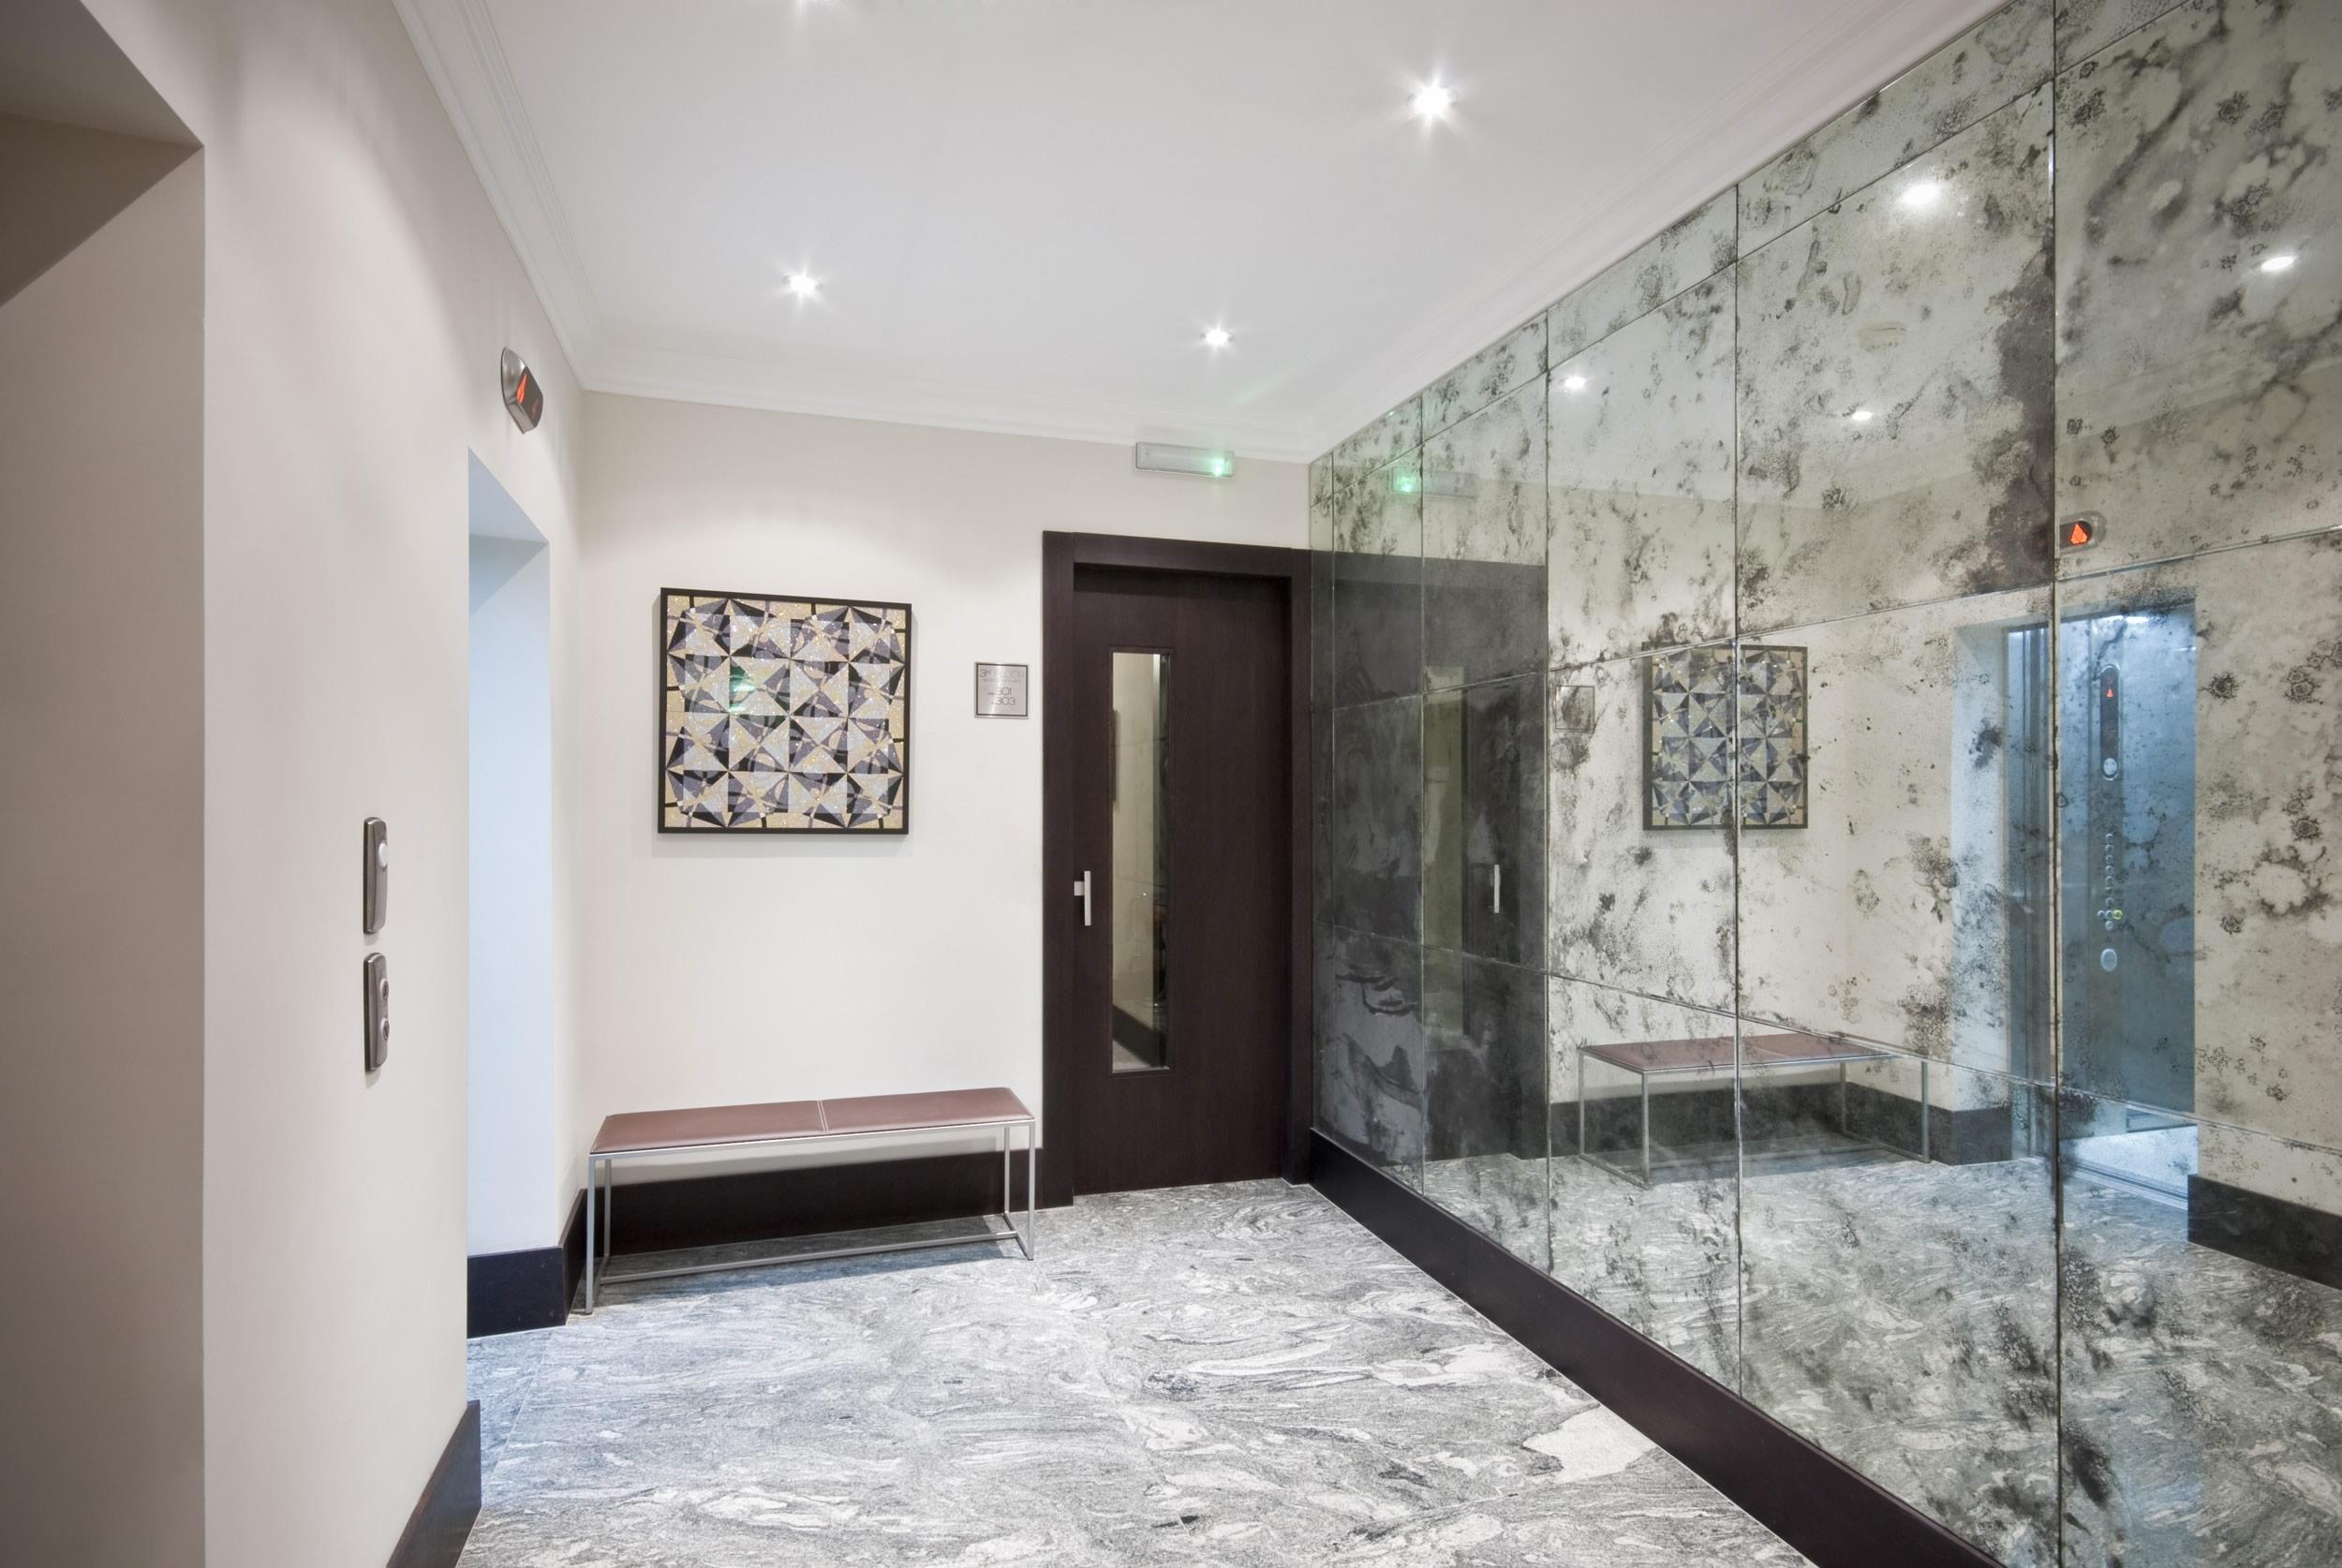 Antique Mirror Feature Walls Saligo Design Wall Features In With Regard To Feature Wall Mirrors (View 5 of 15)